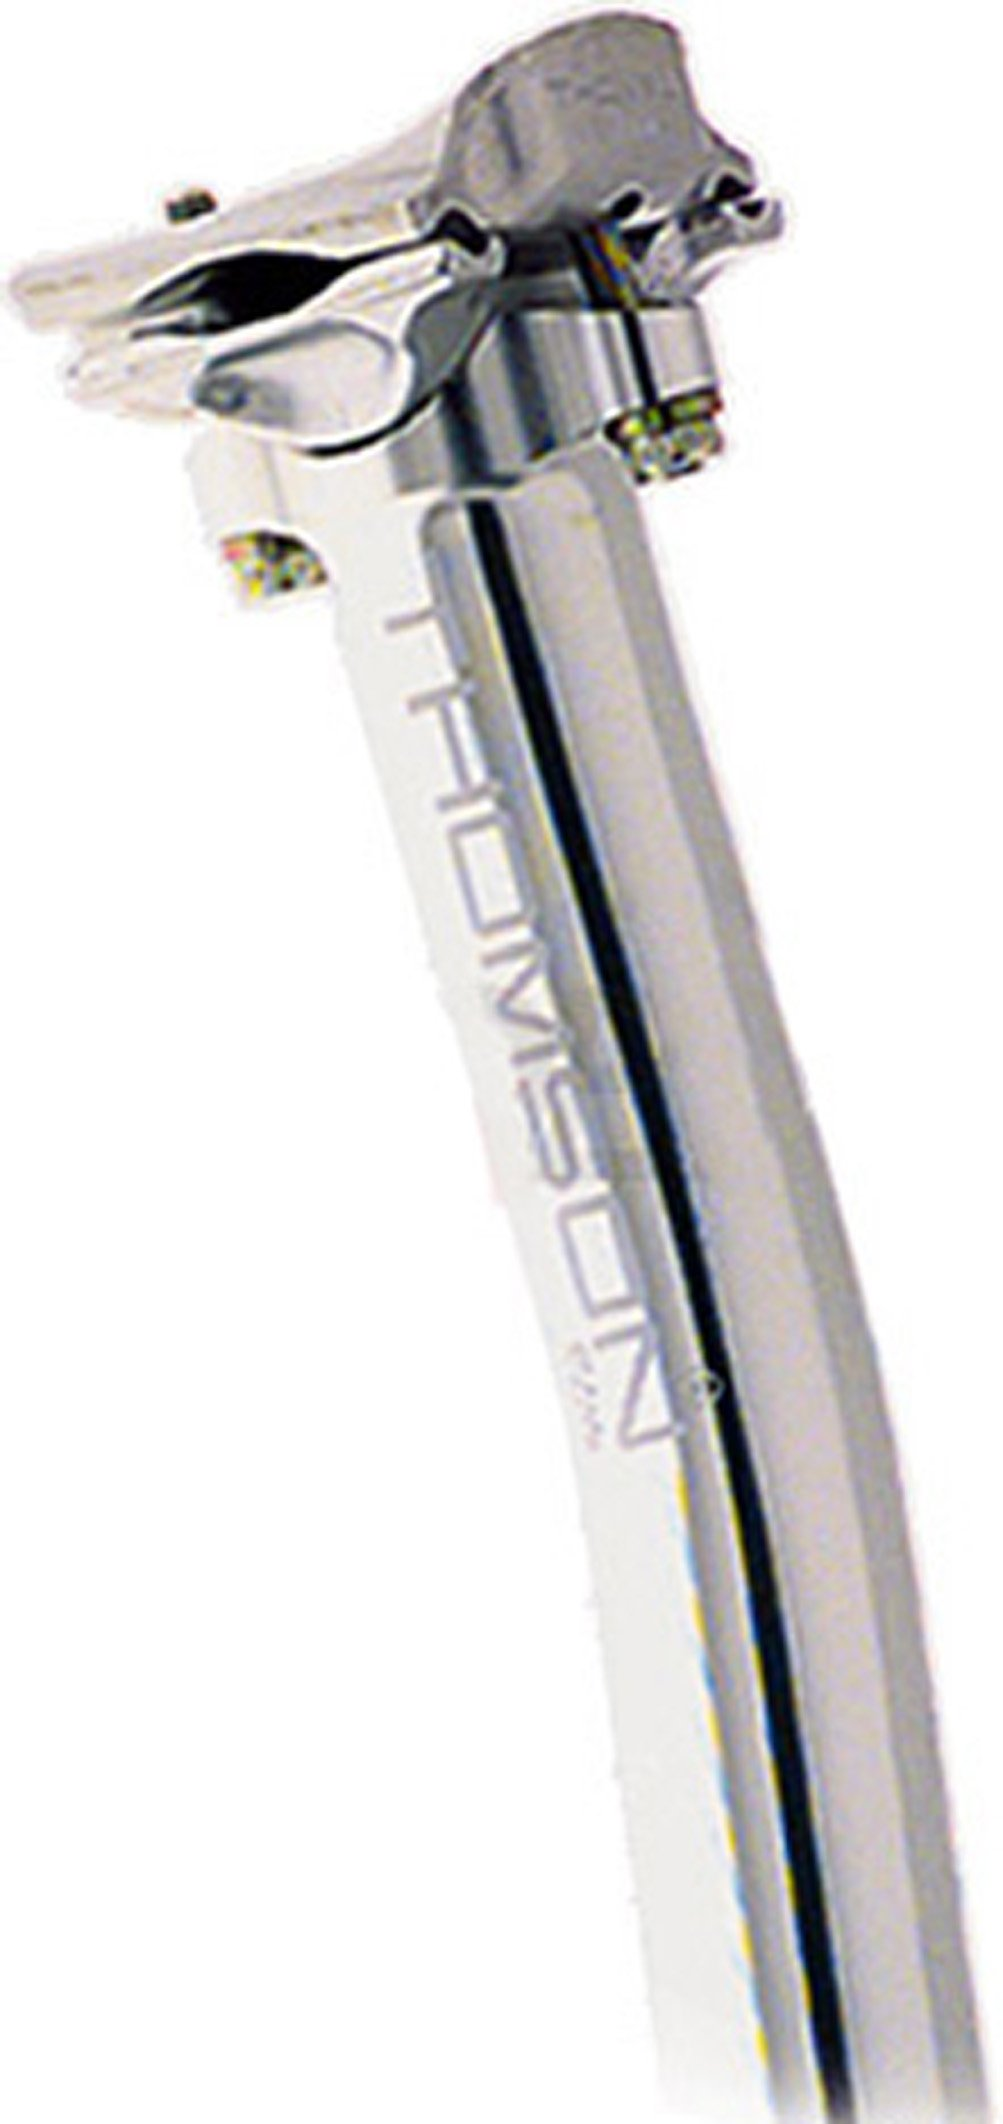 Thomson Elite SB 27.2X330mm Stem (Silver) by Thomson